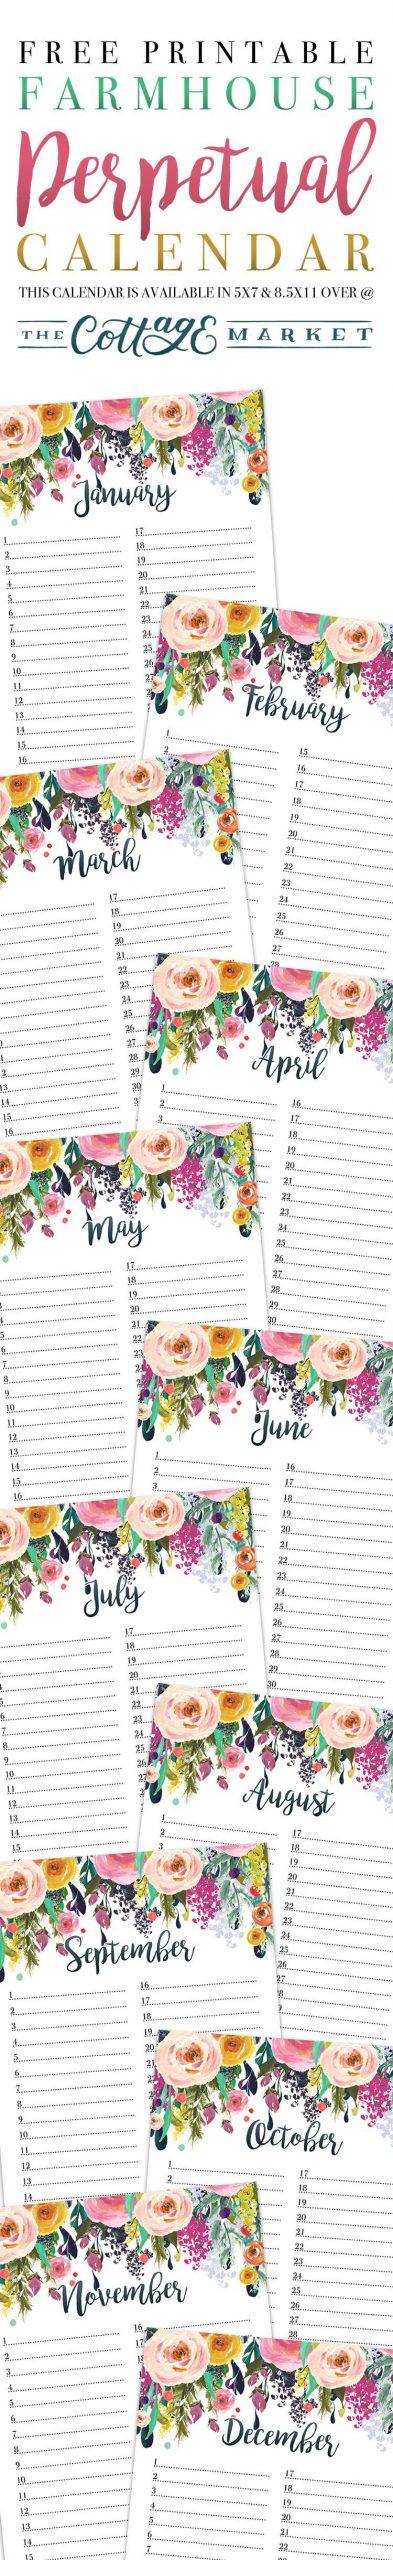 Free Printable Farmhouse Perpetual Calendar   Perpetual Birthday Calendars That We Can Fill In